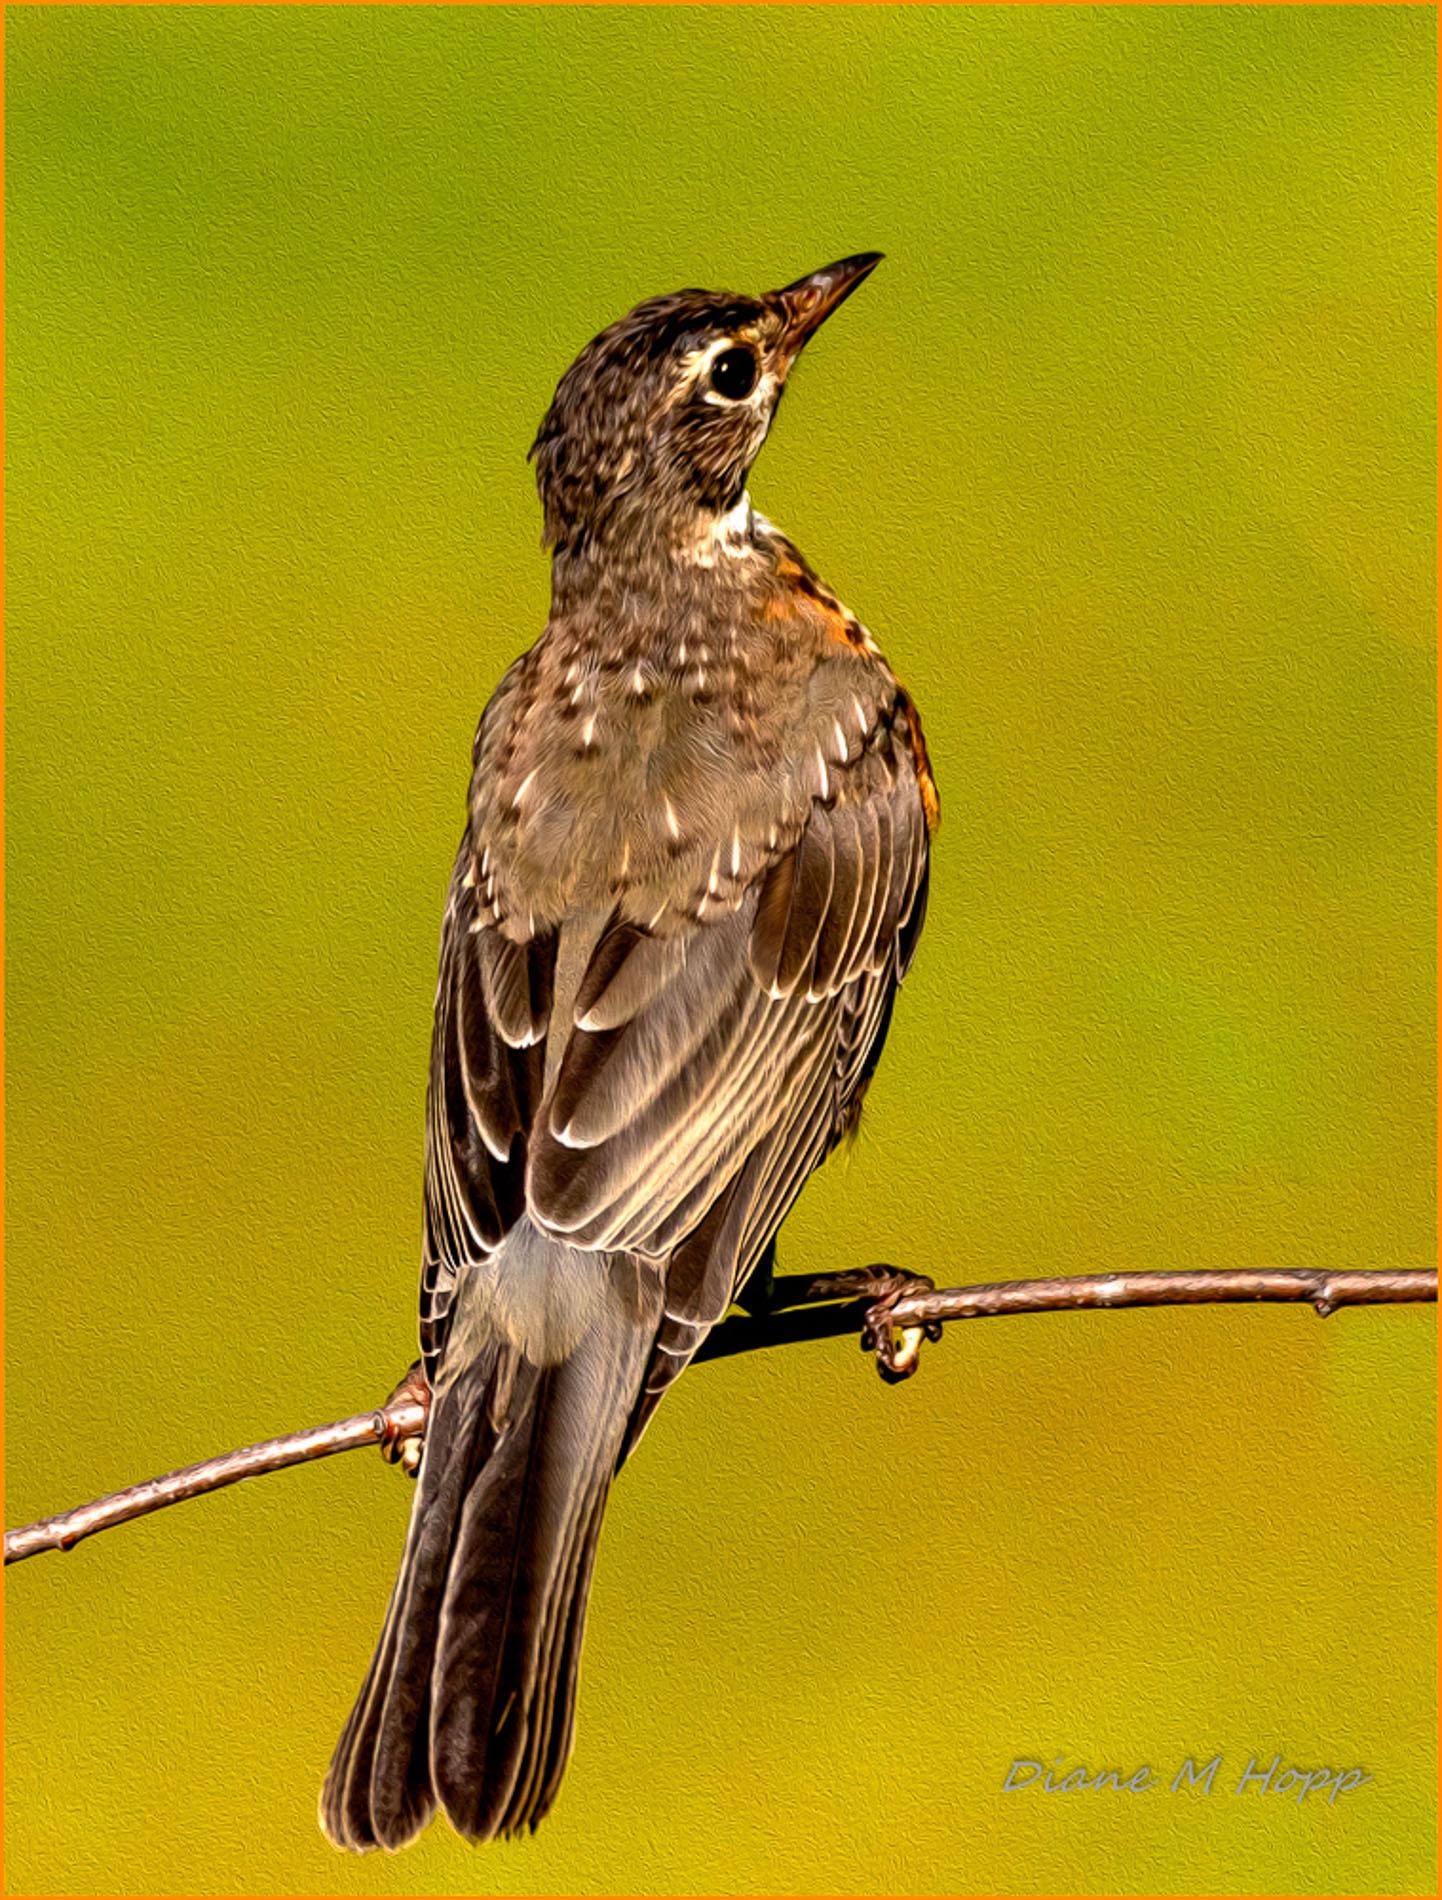 Young American Robin - DMHopp-1